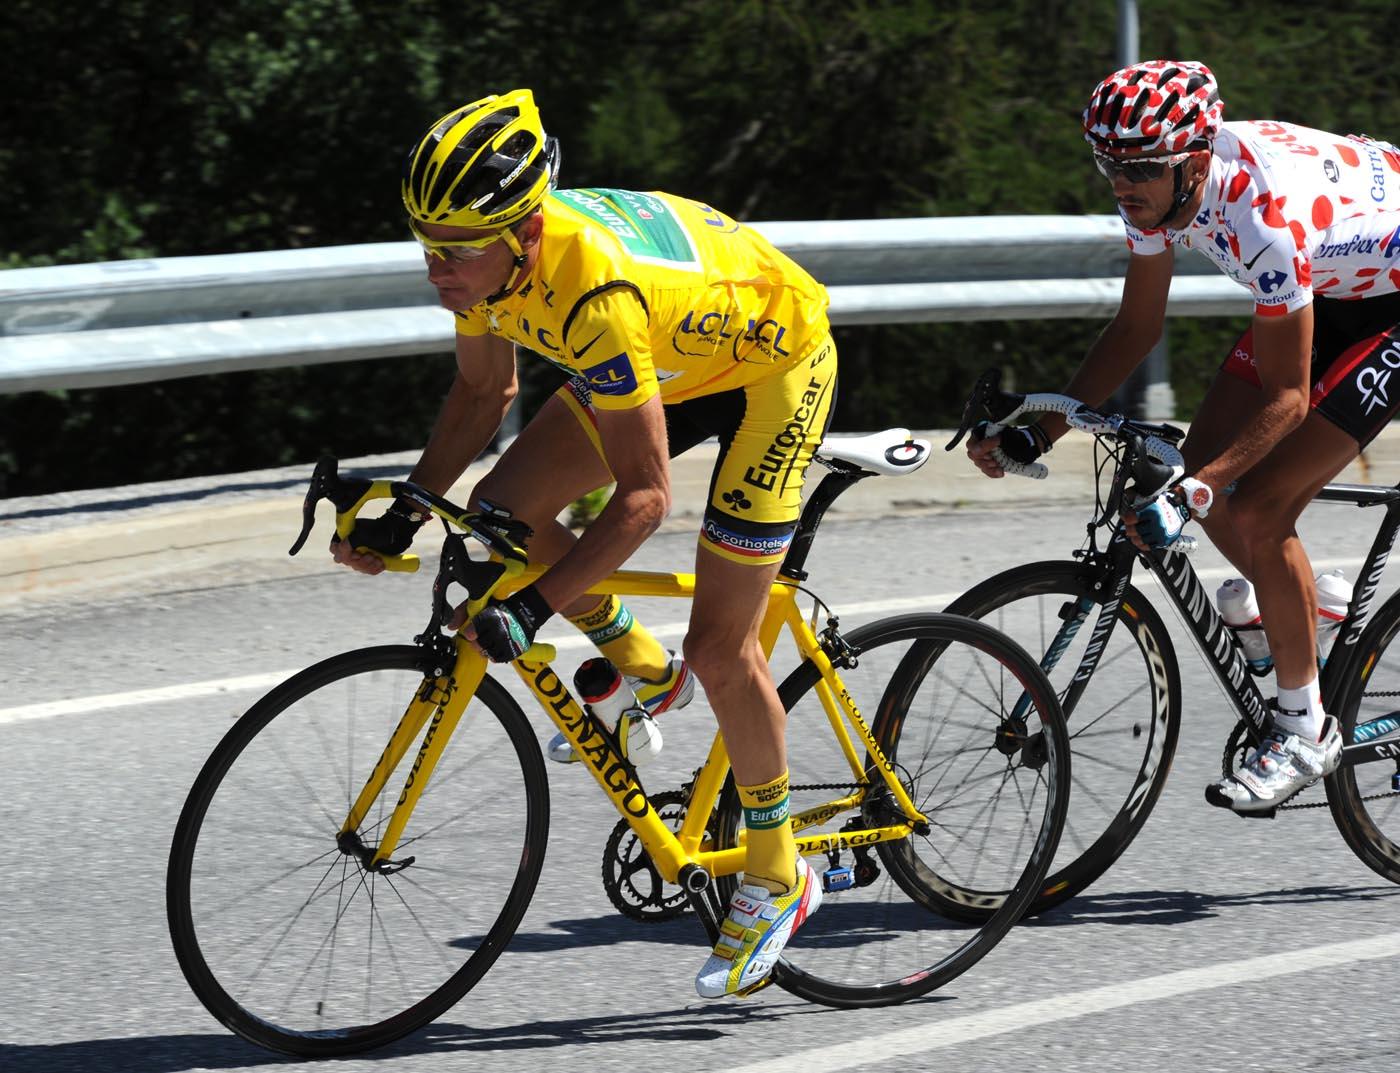 Thomas Voeckler and Jelle Vanendert, Tour de France 2011, stage 17